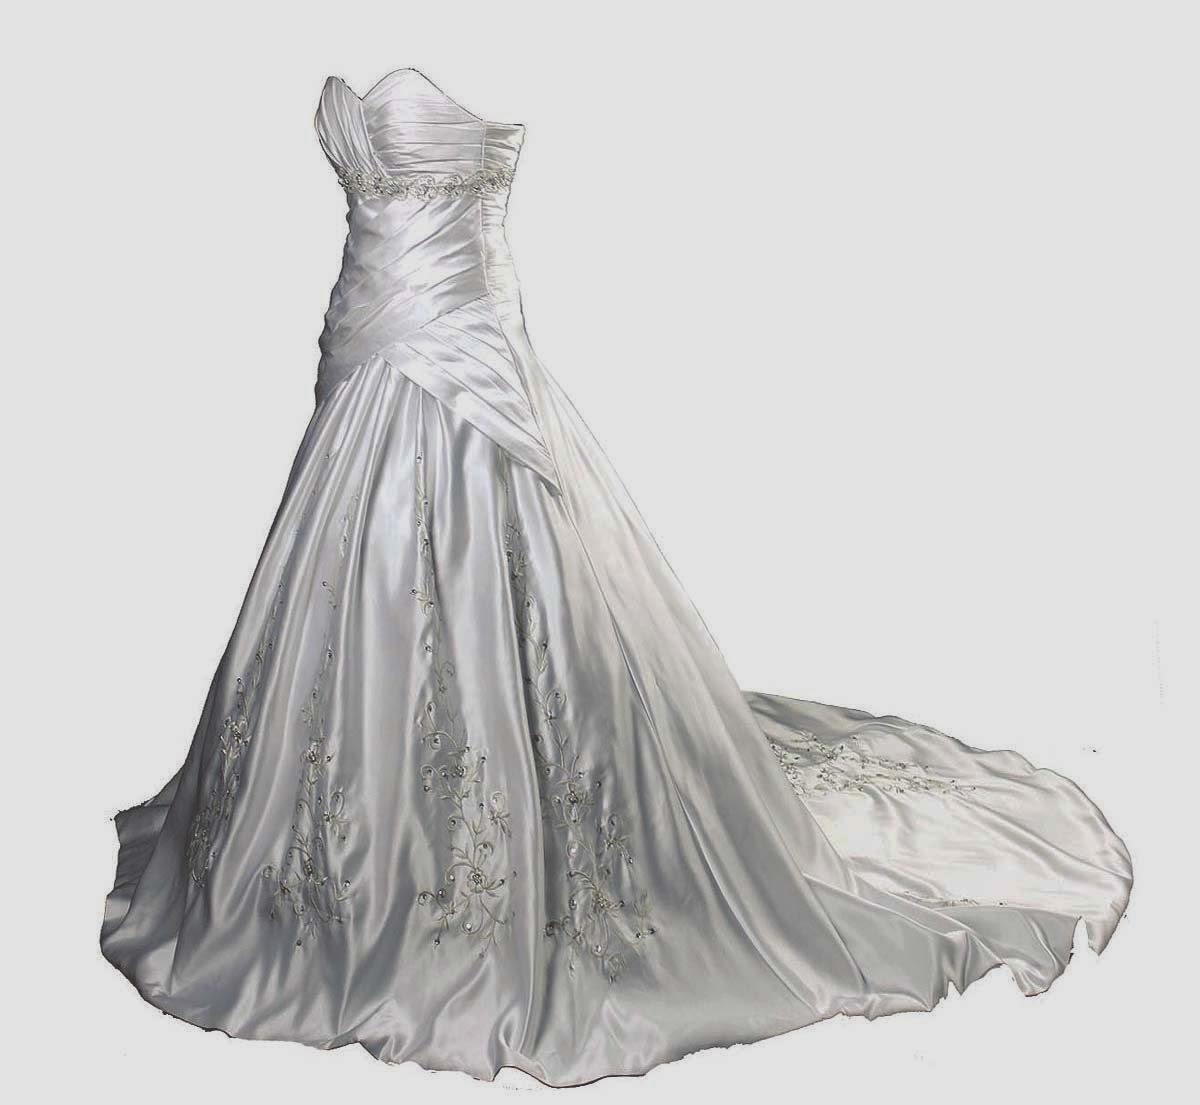 Faironly J5 White Ivory Sweetheart Wedding